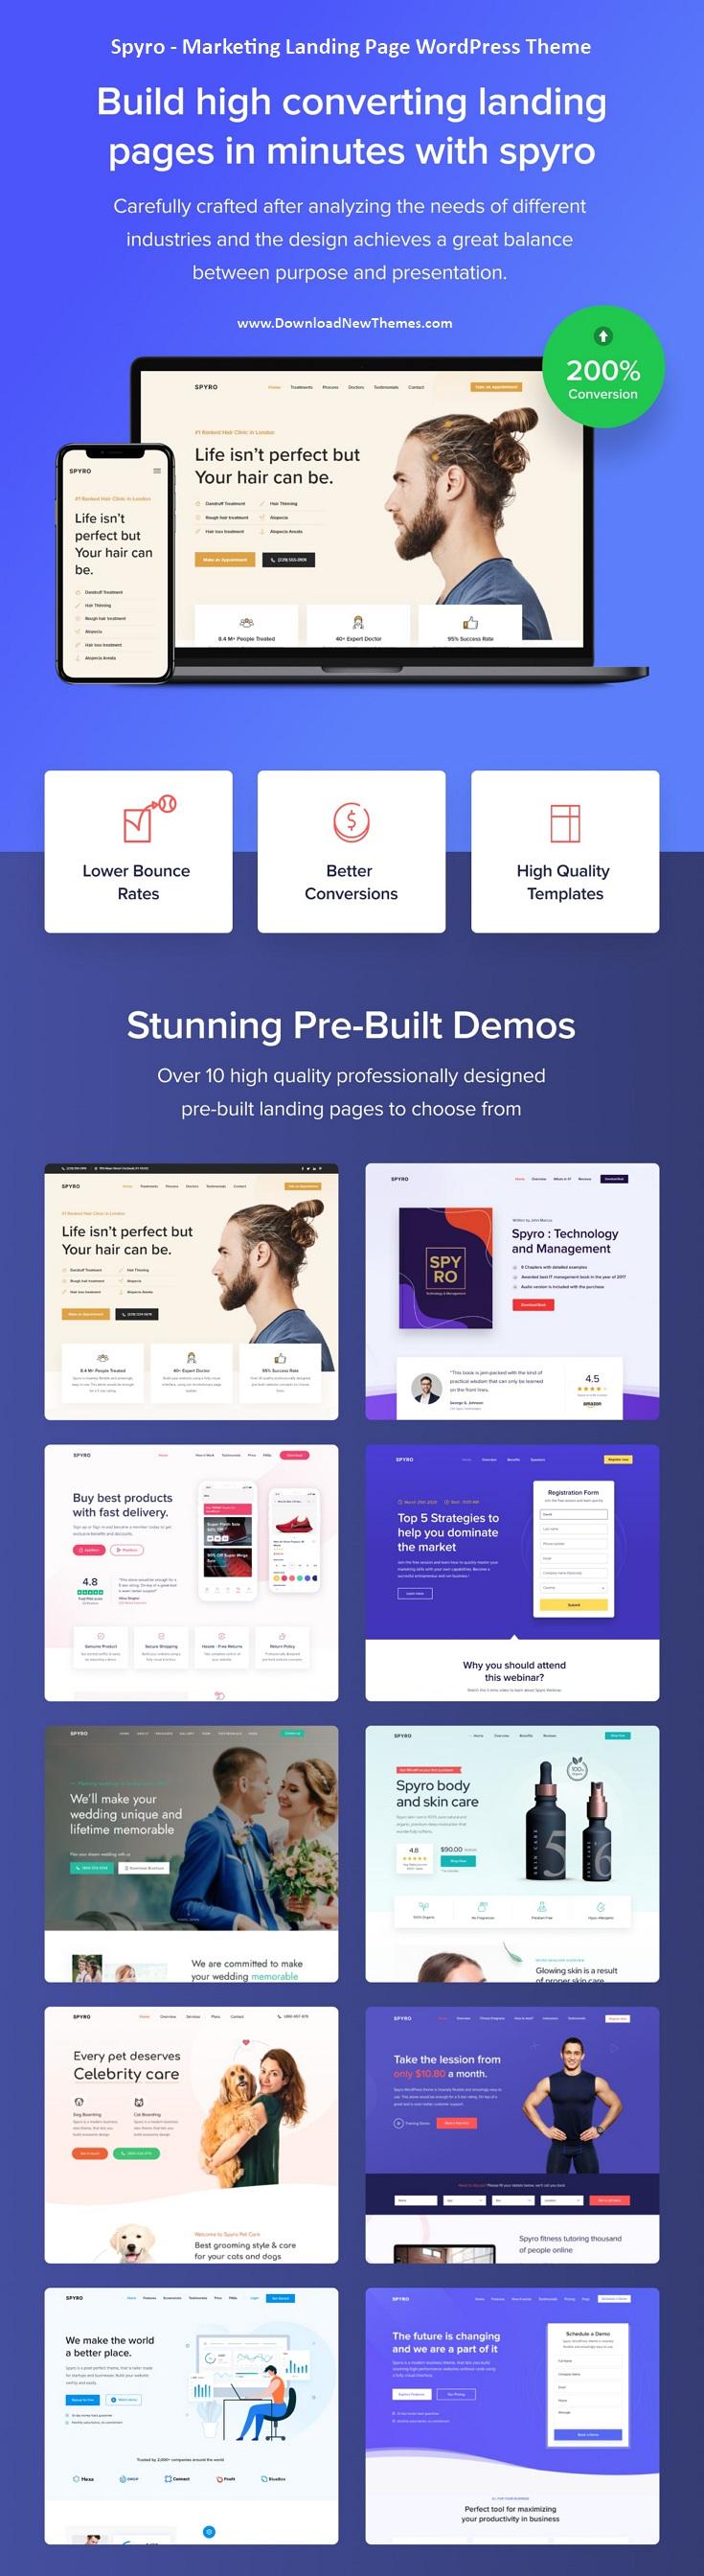 Spyro - Marketing Landing Page WordPress Theme